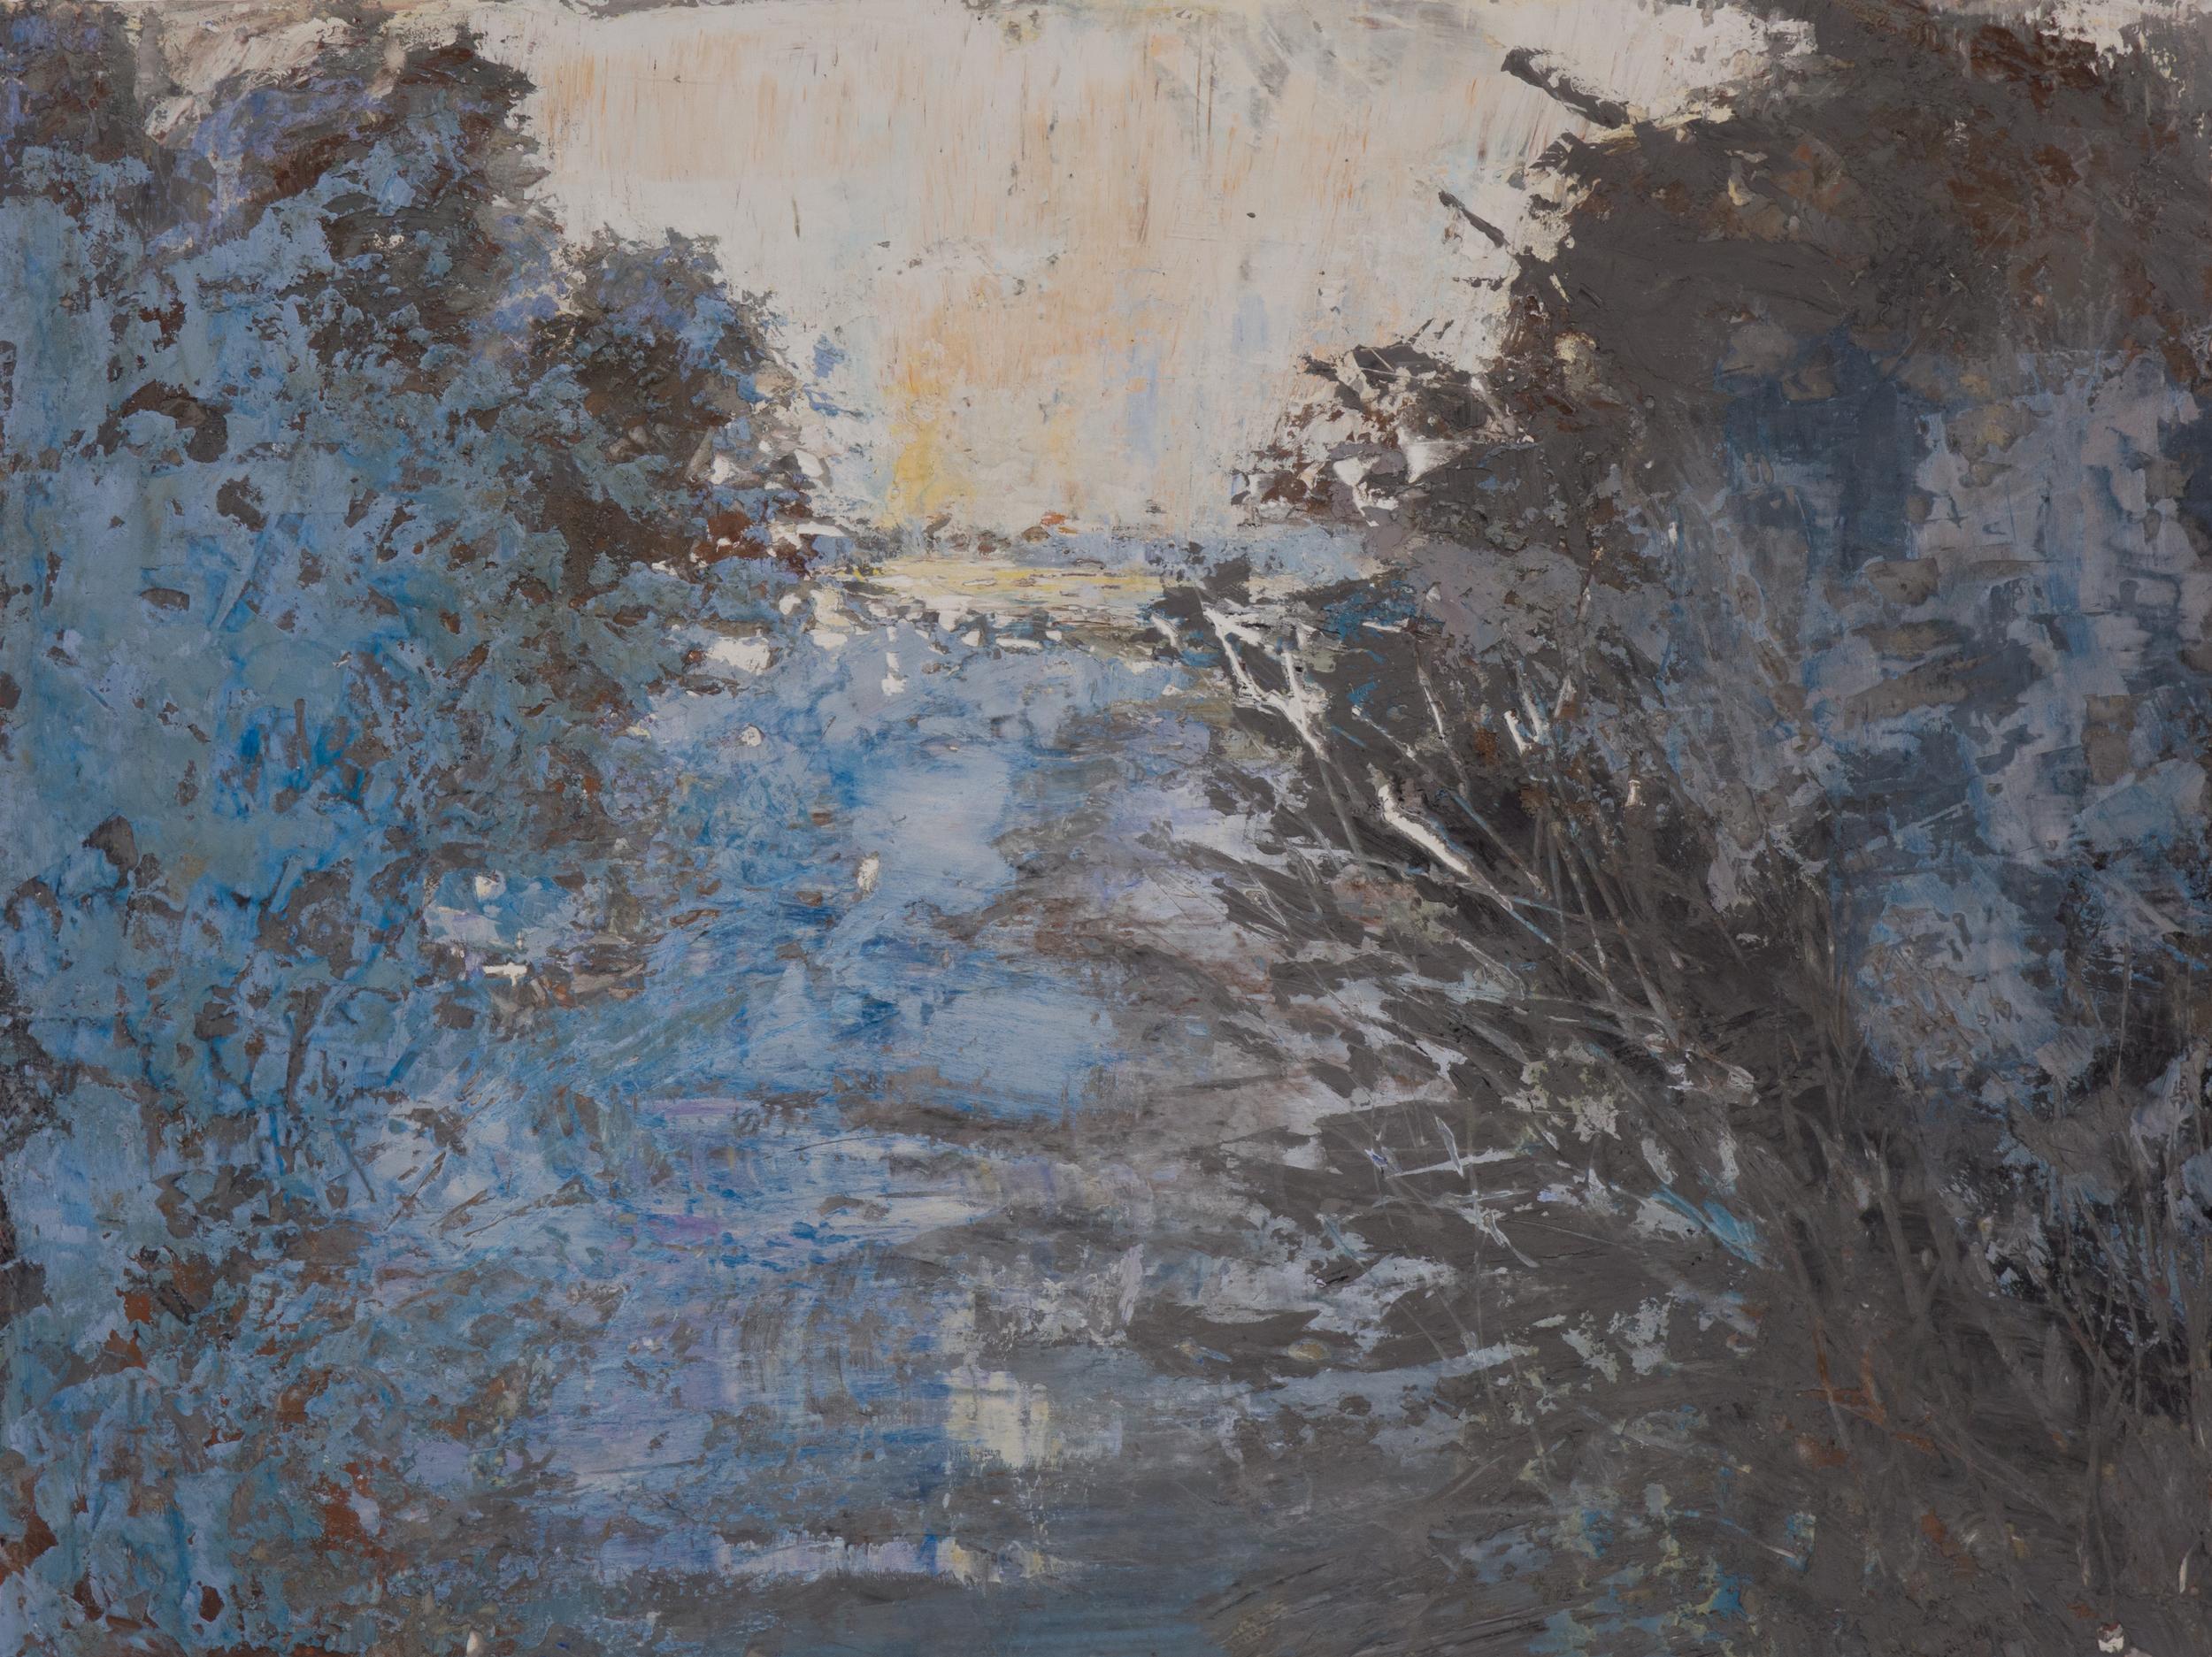 SV-052, Shelley Vanderbyl, Breaking Branches, 2016,Fresco on Panel,30x40